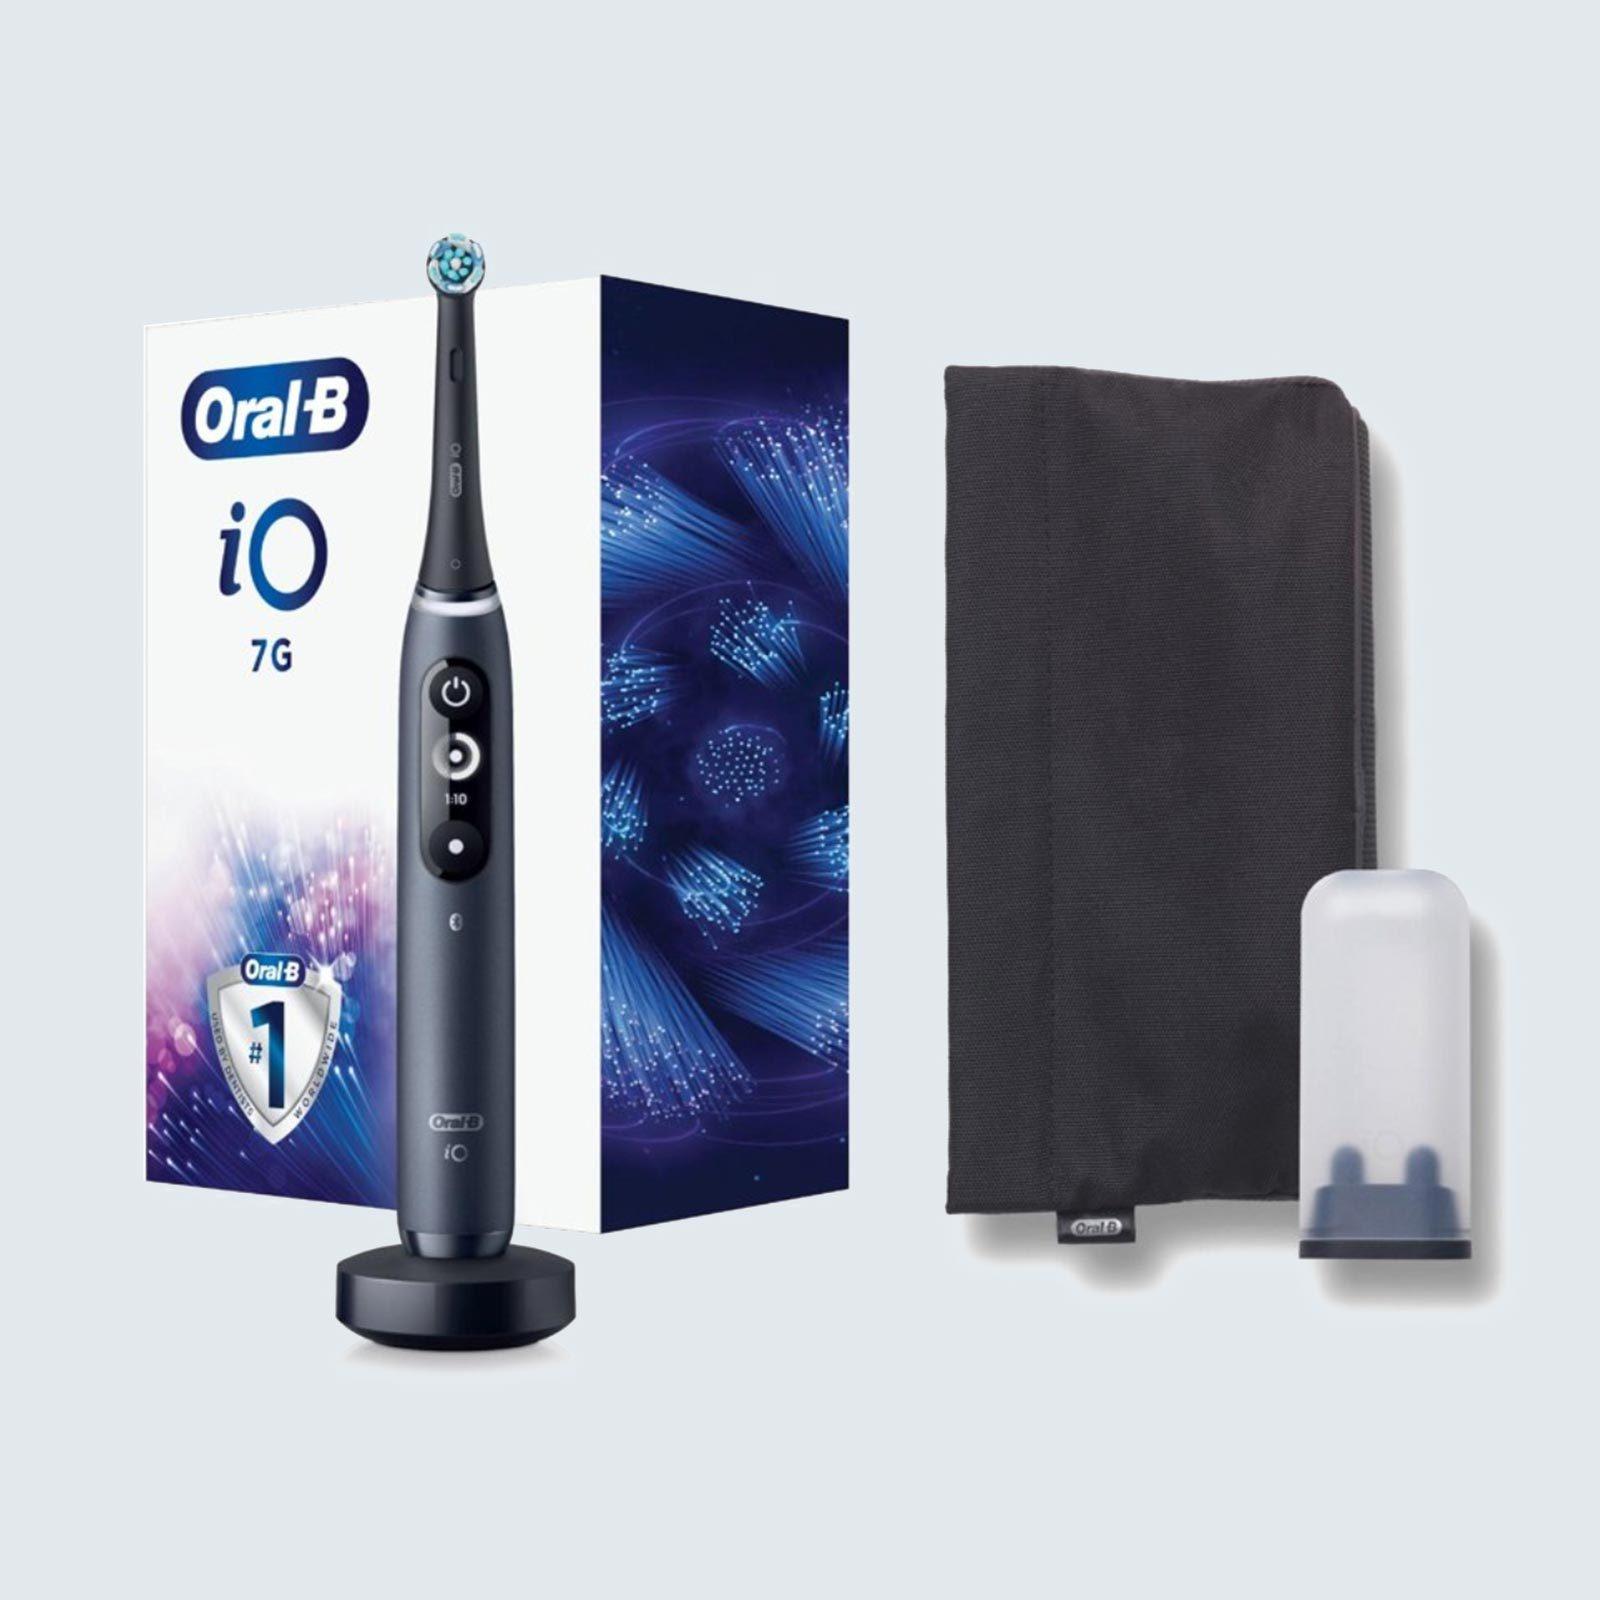 Oral-B iO Series 7G Electric Toothbrush